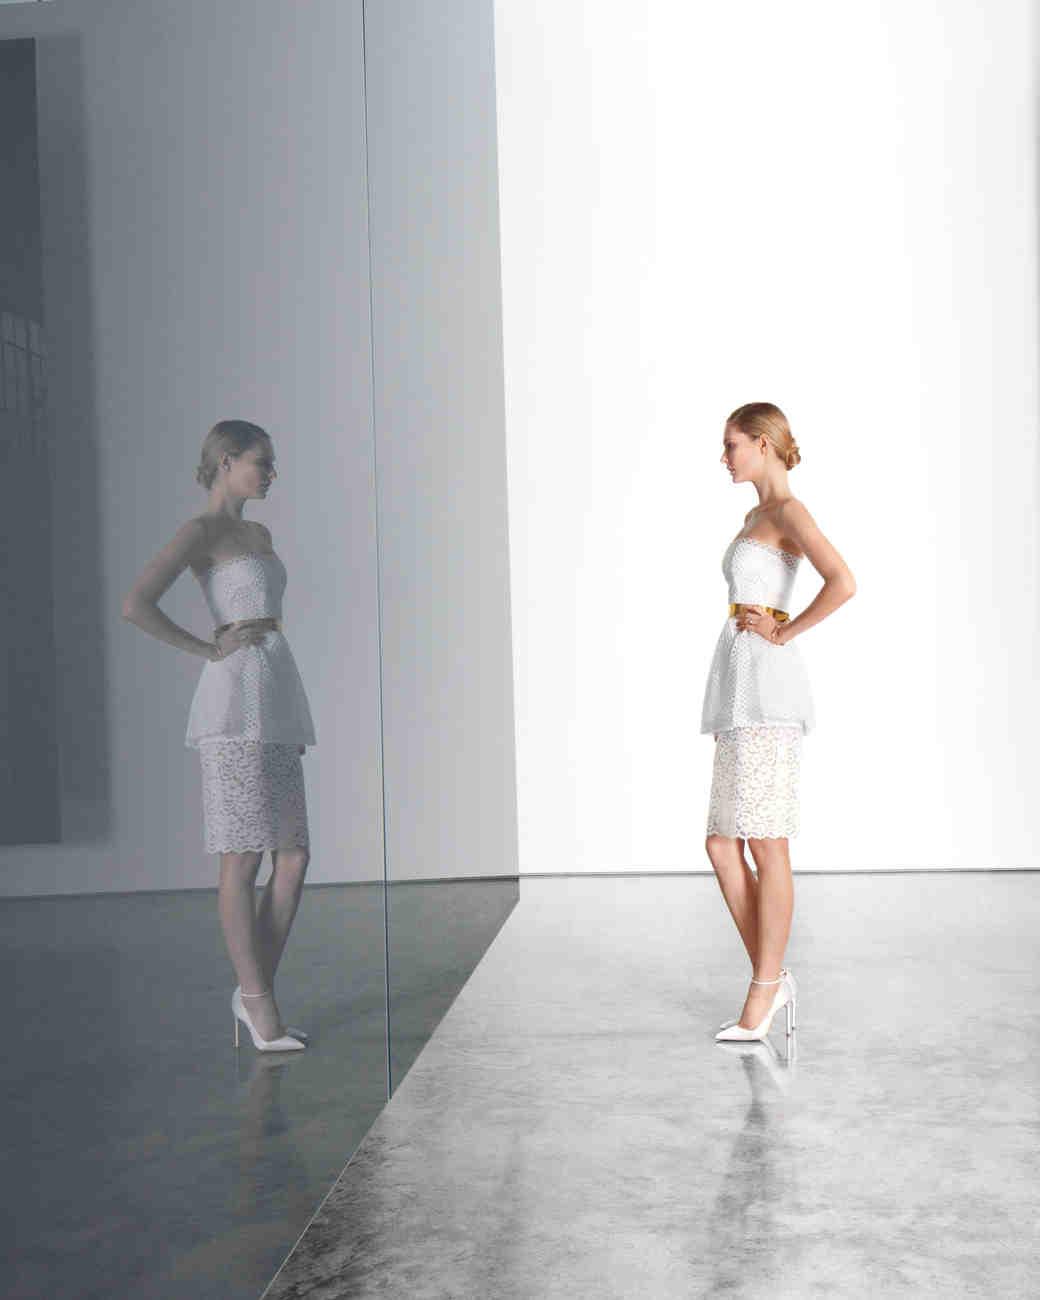 weddingdress-fashion-richter-olga-mwd110783.jpg